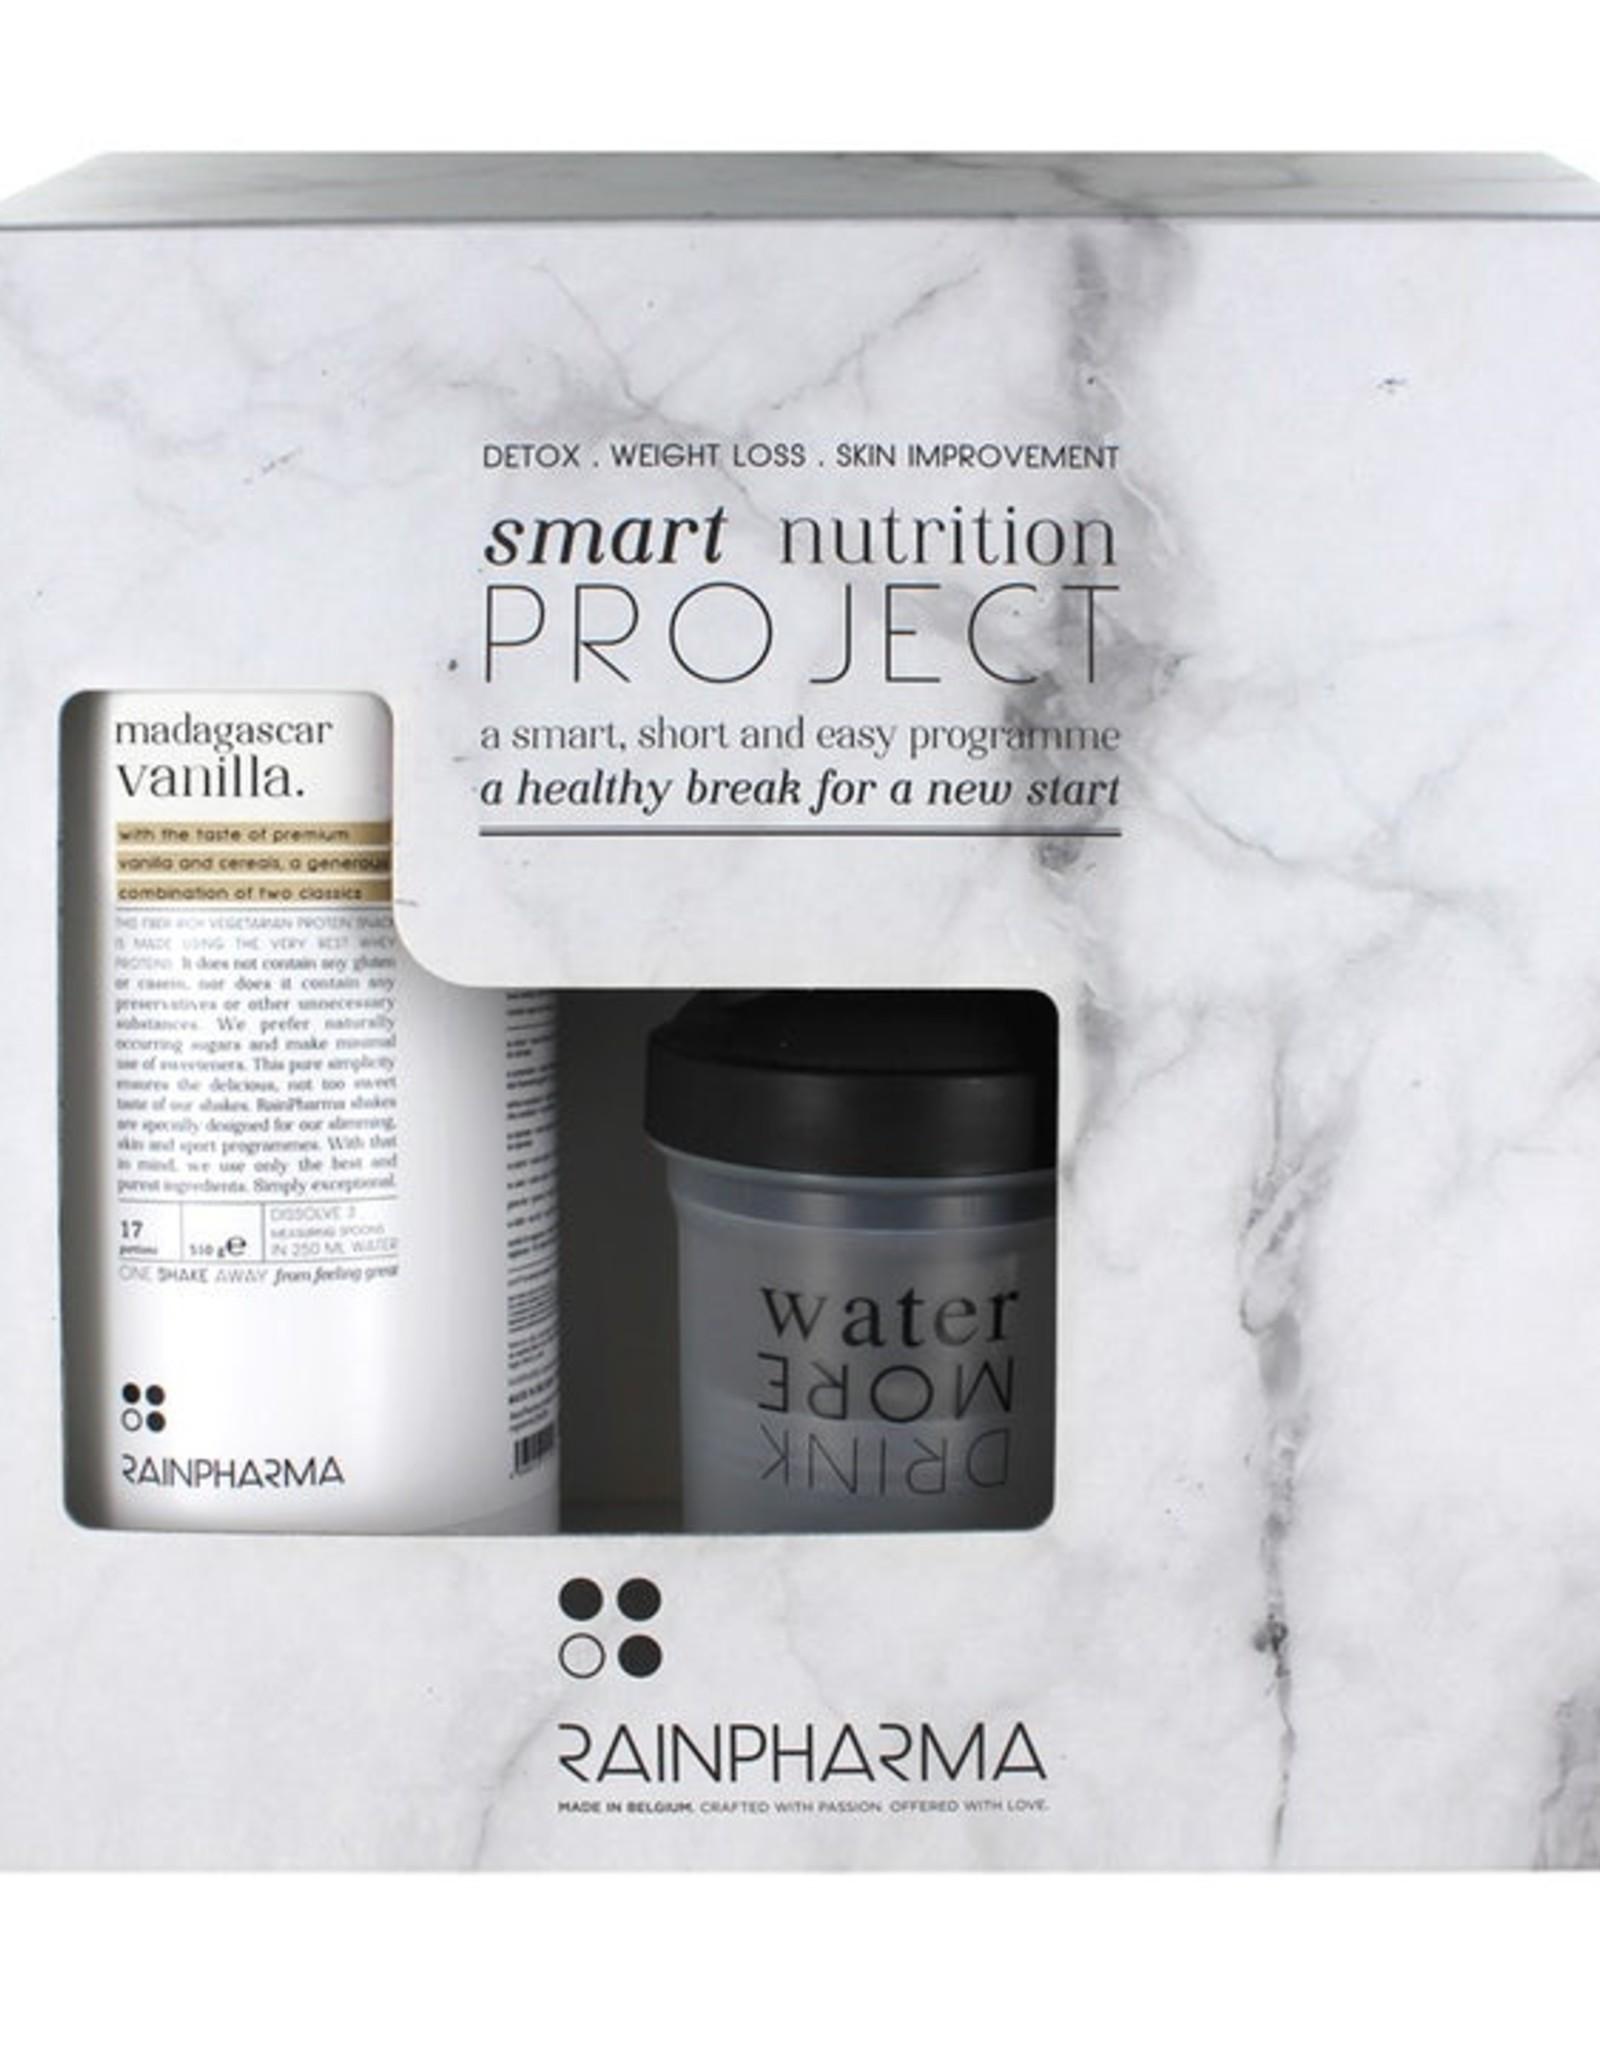 RainPharma Rainpharma - SNP BOX Madagascar Vanilla